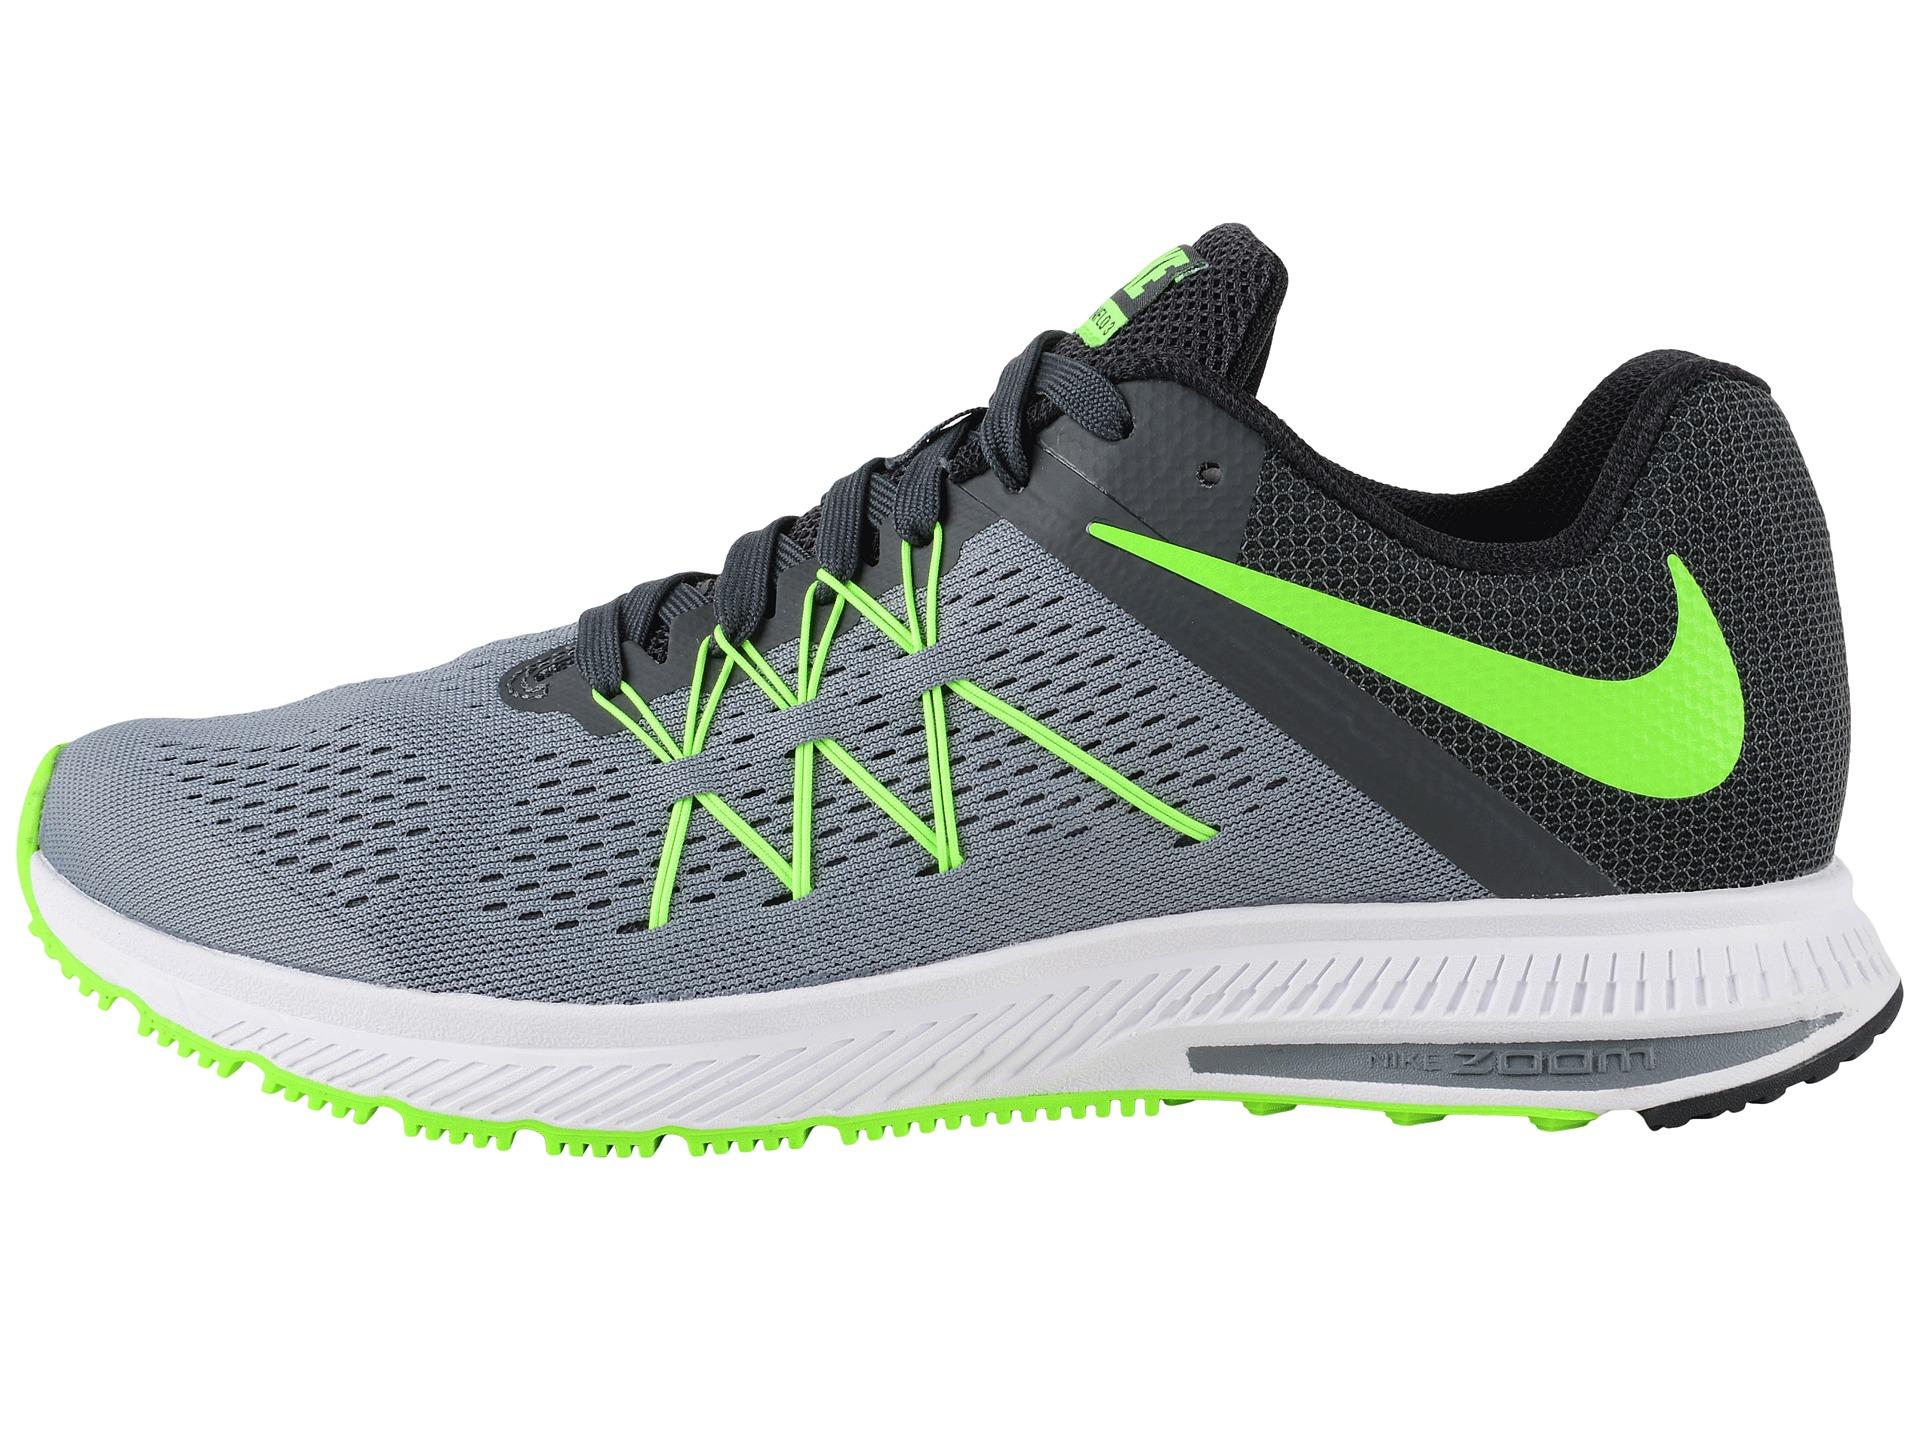 Nike Zoom Winflo 3 Caracteristicas